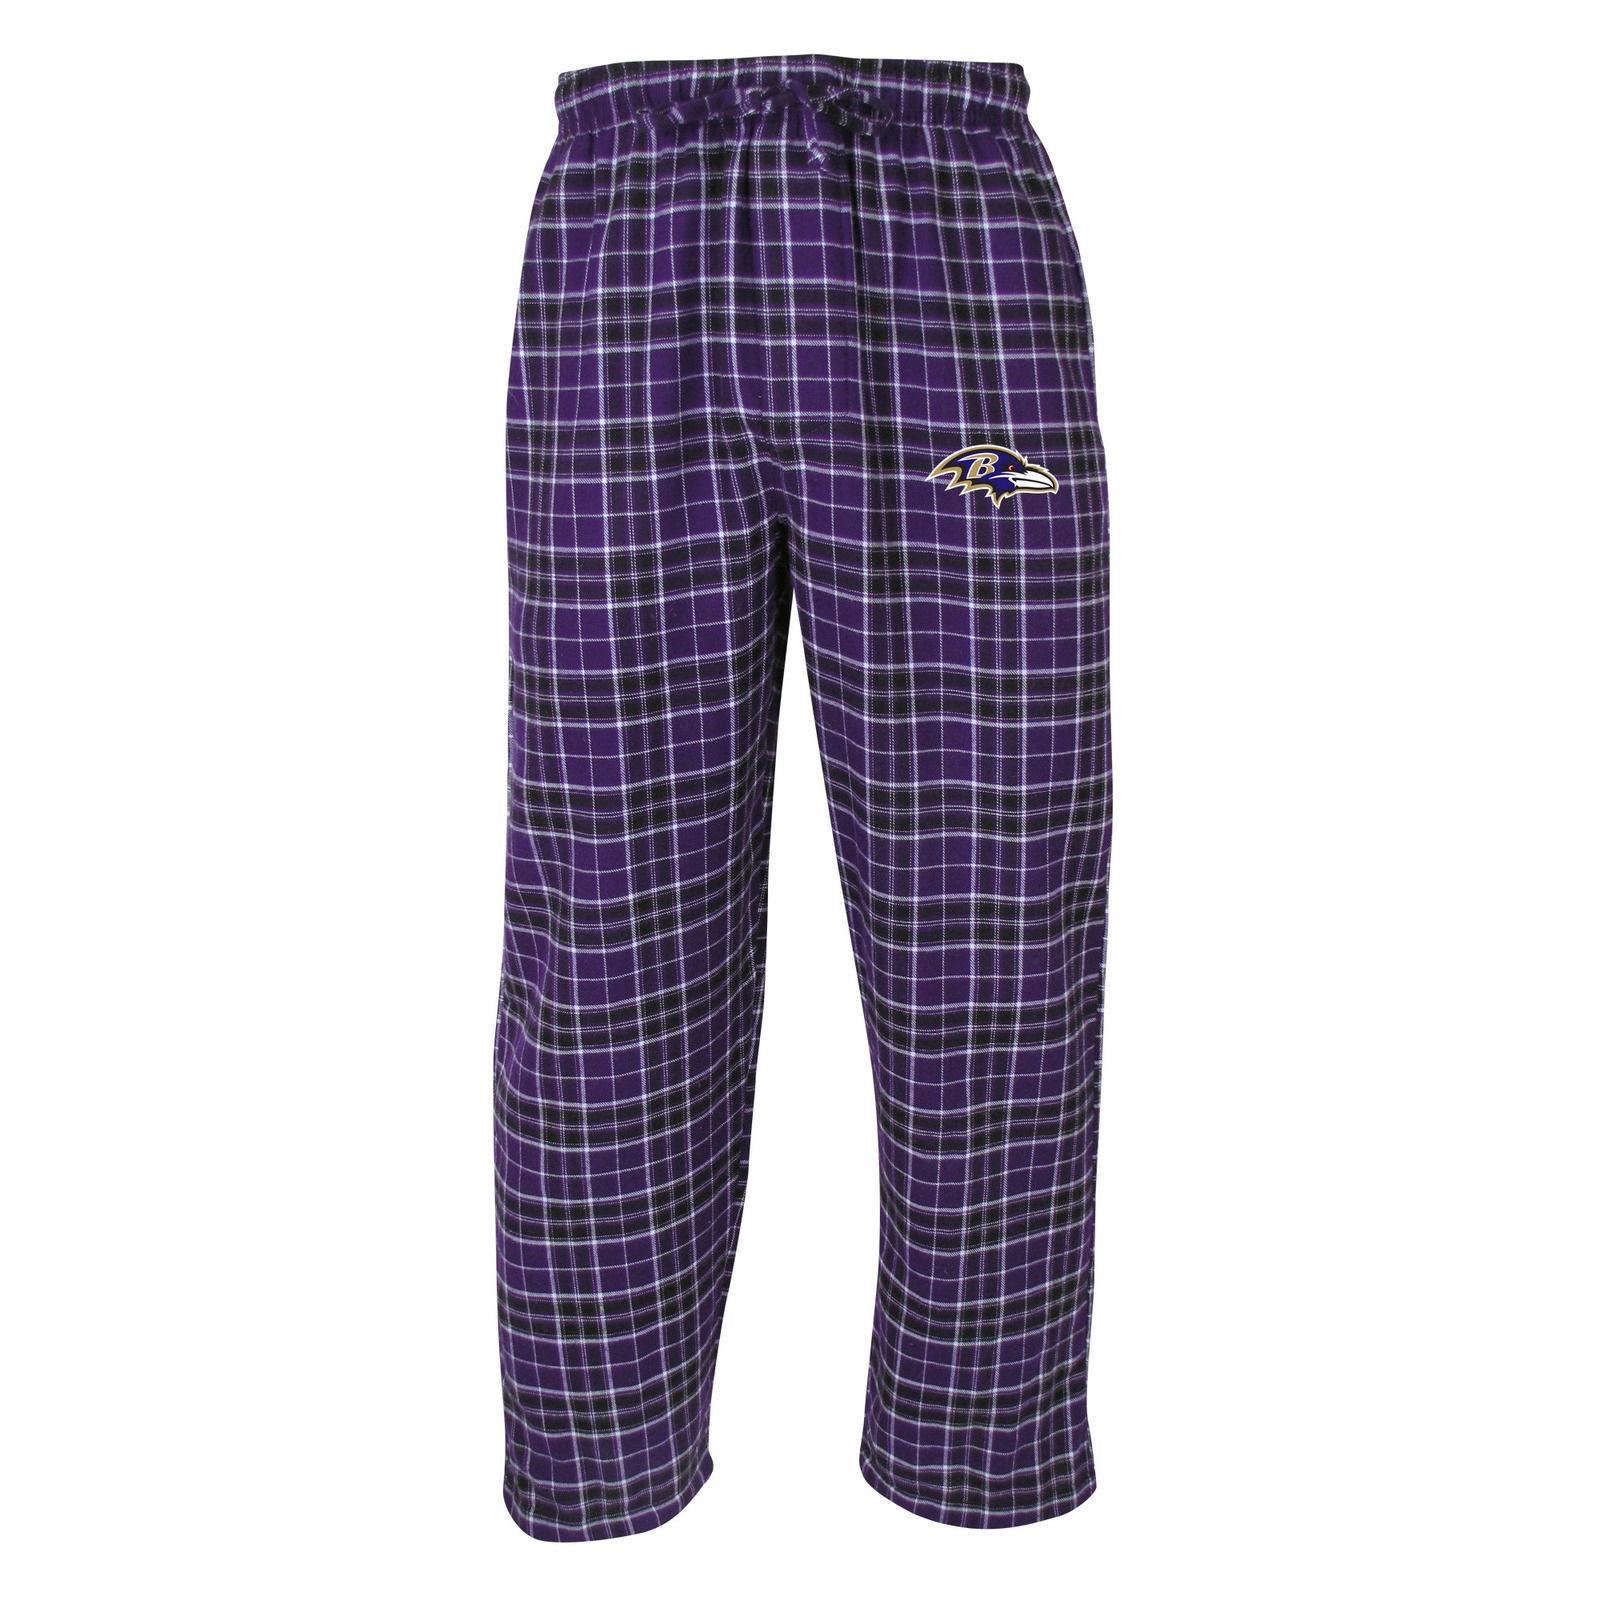 Baltimore Ravens Pajama Pants Men's NFL Roster Flannel Sleep Lounge Bottoms